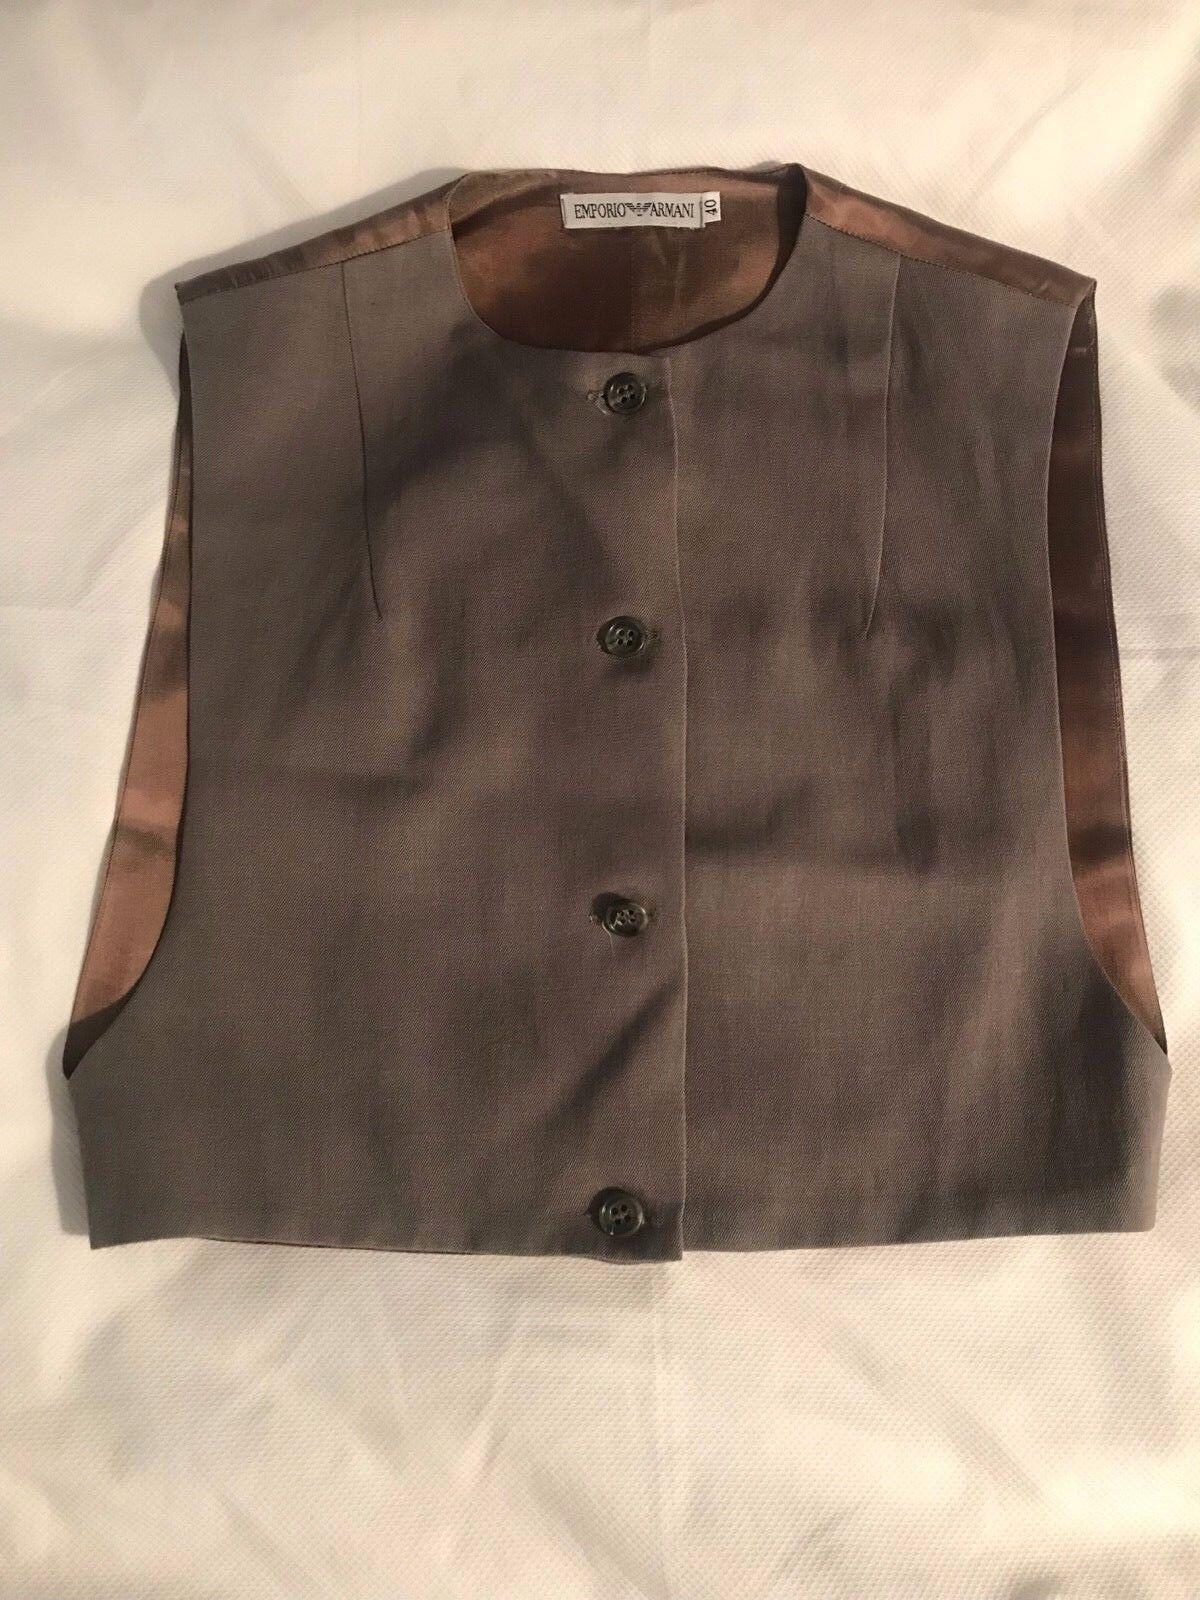 Vintage Emporio Armani Vest—Size 40